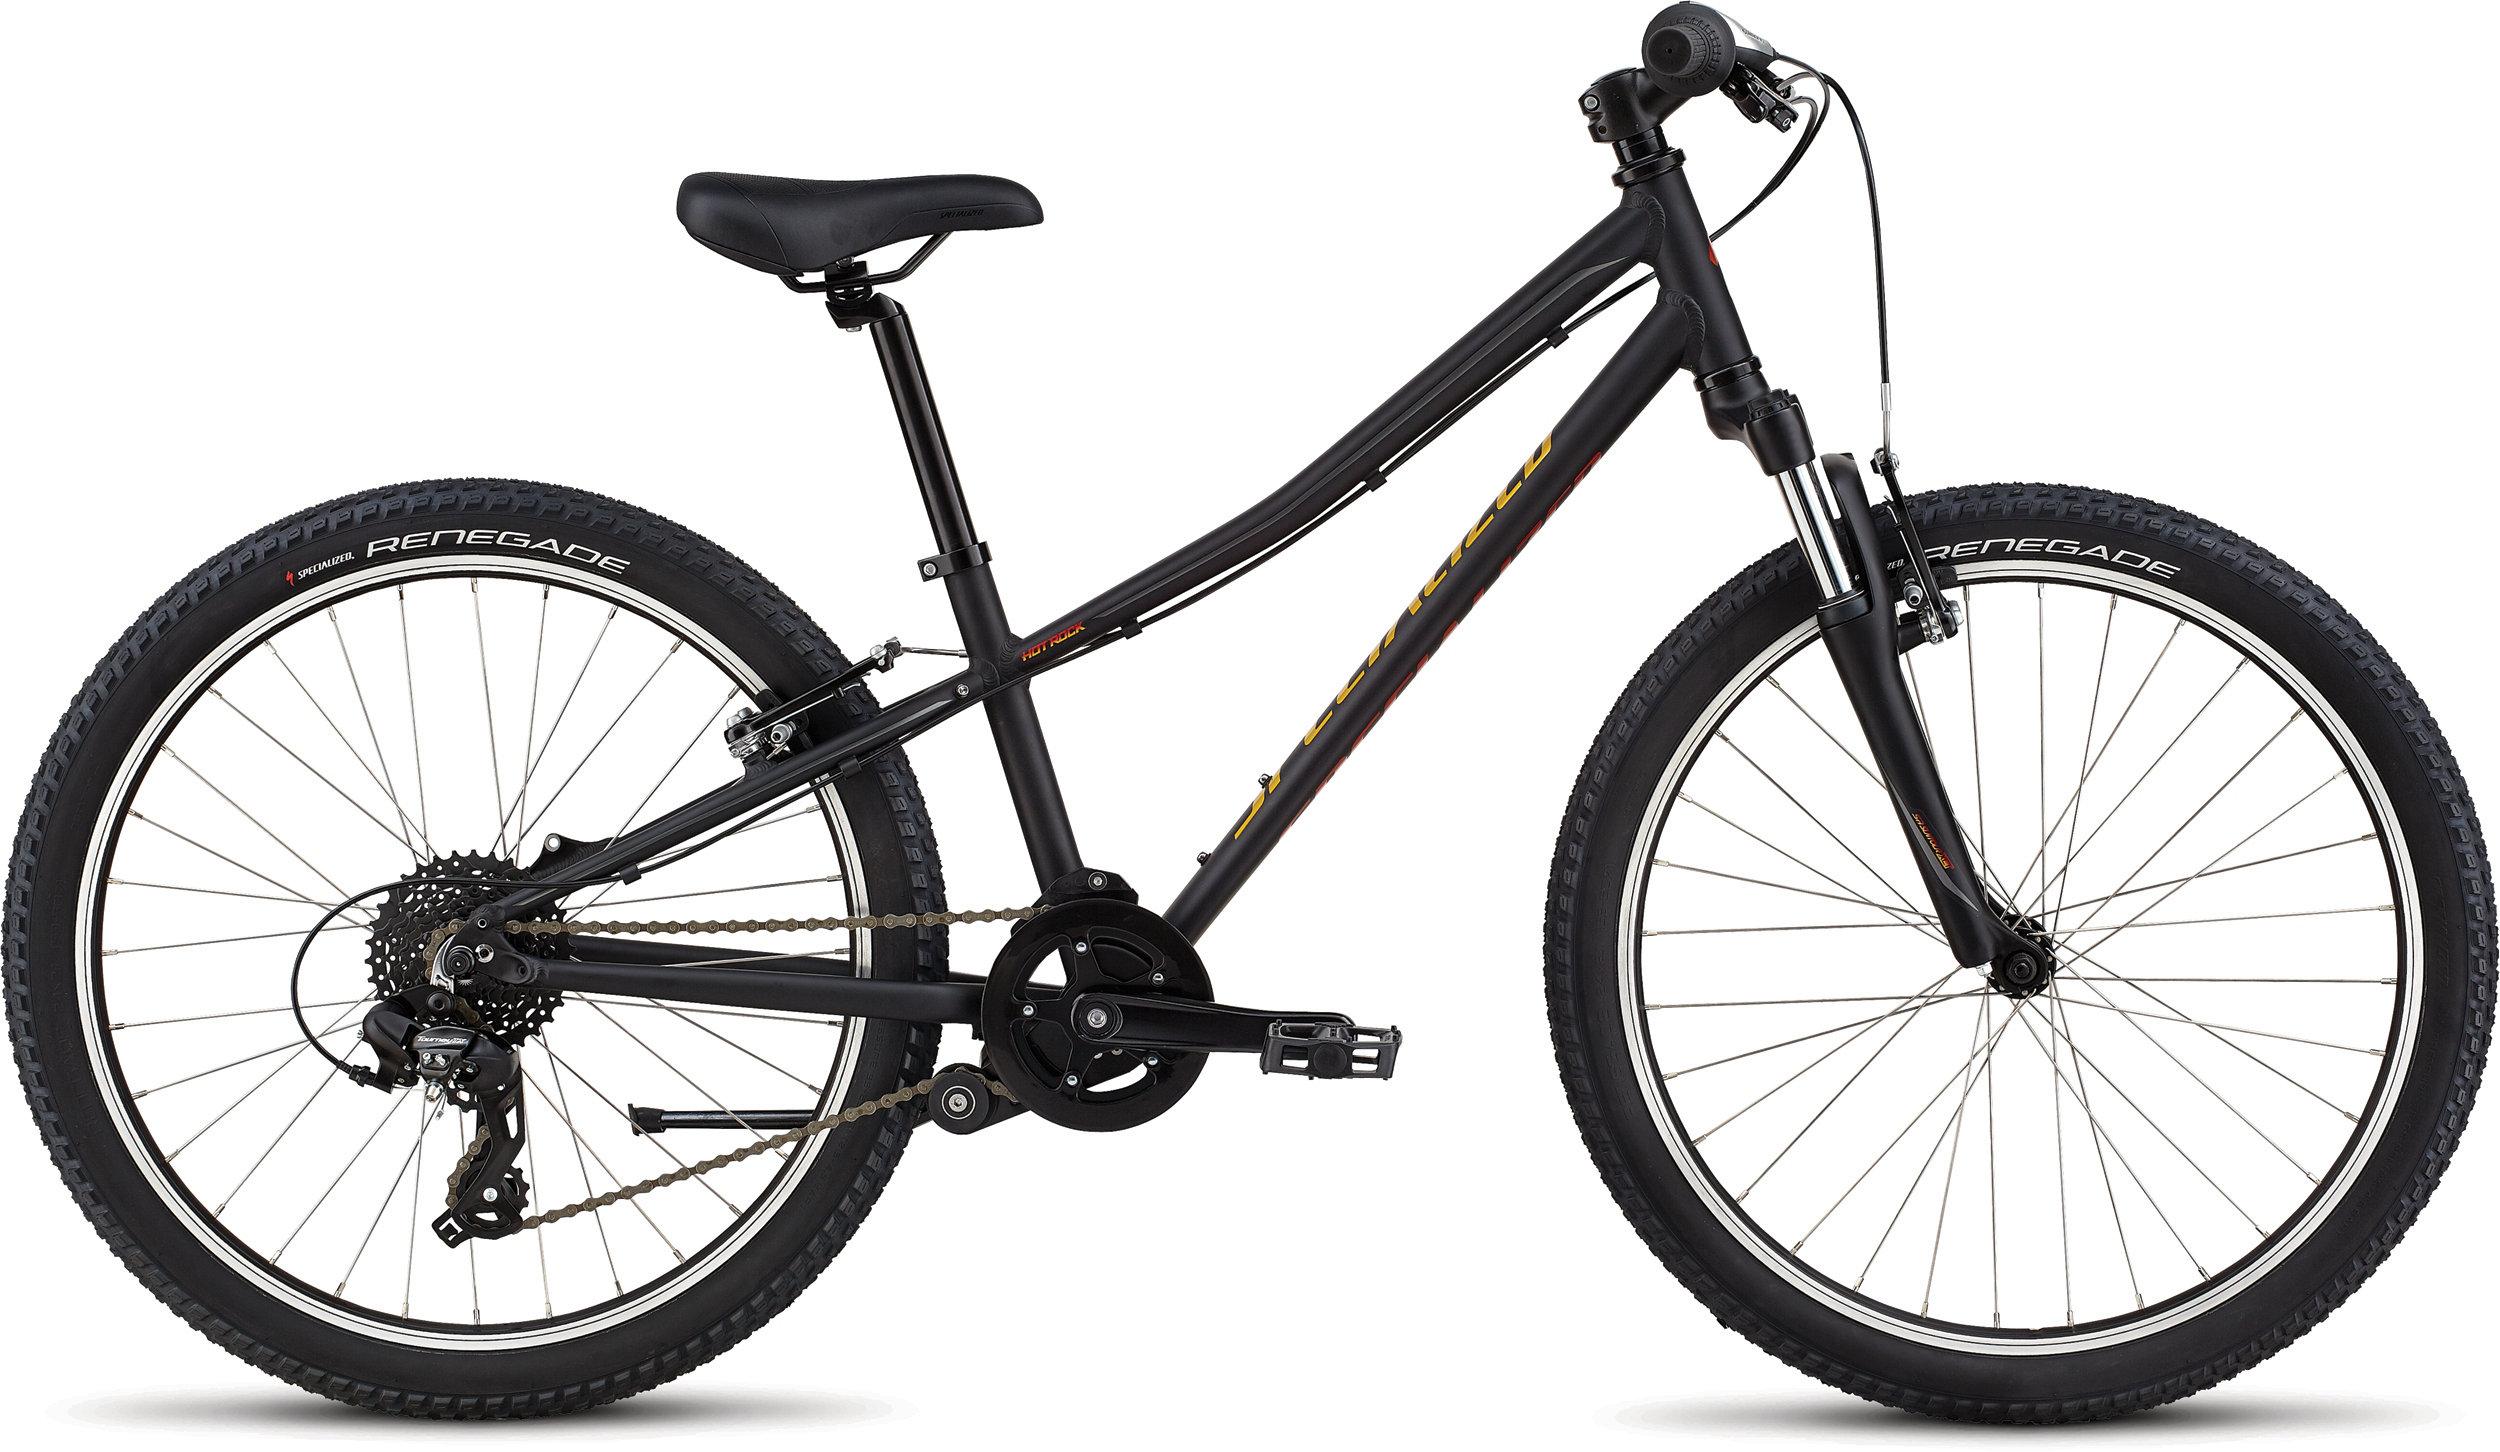 Specialized Hotrock 24 Black/74 Fade 11 - Alpha Bikes